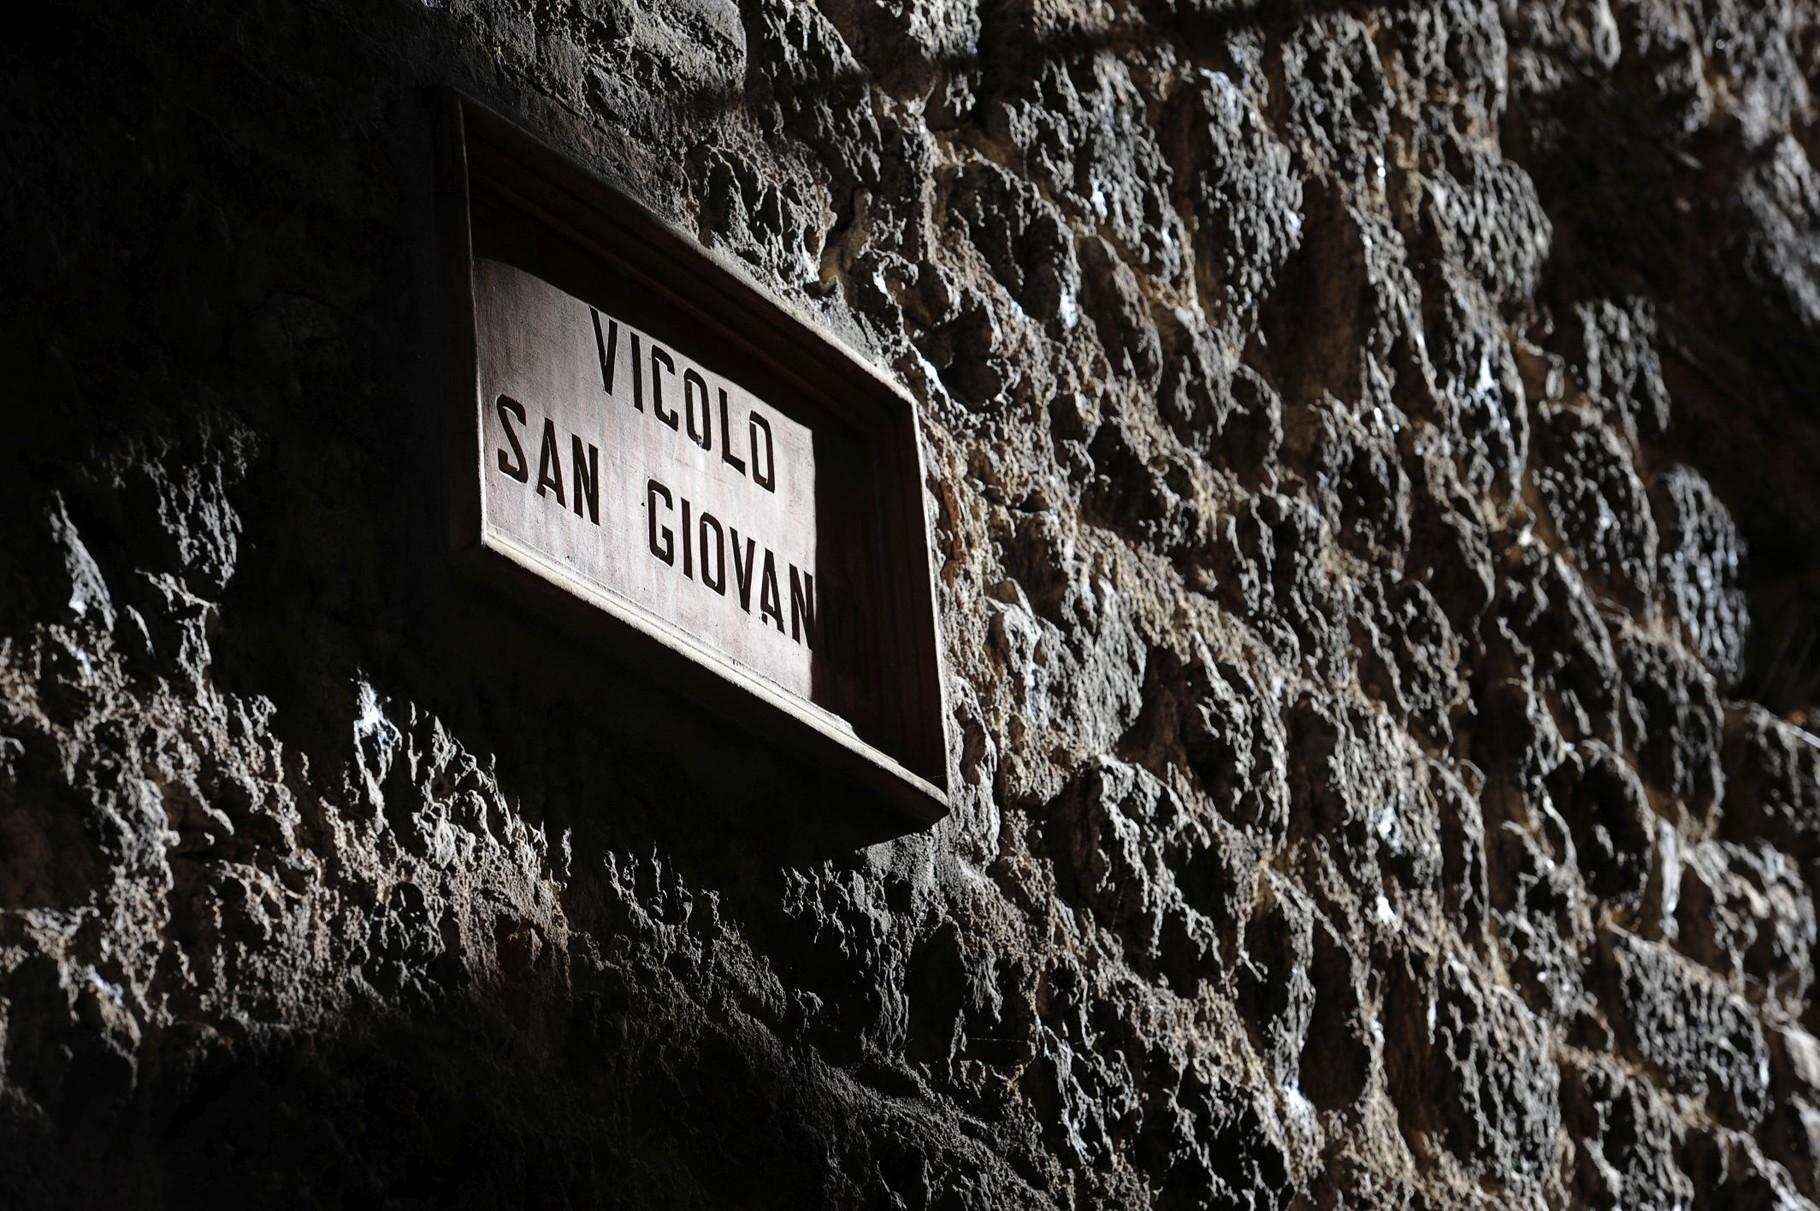 San Giovanni